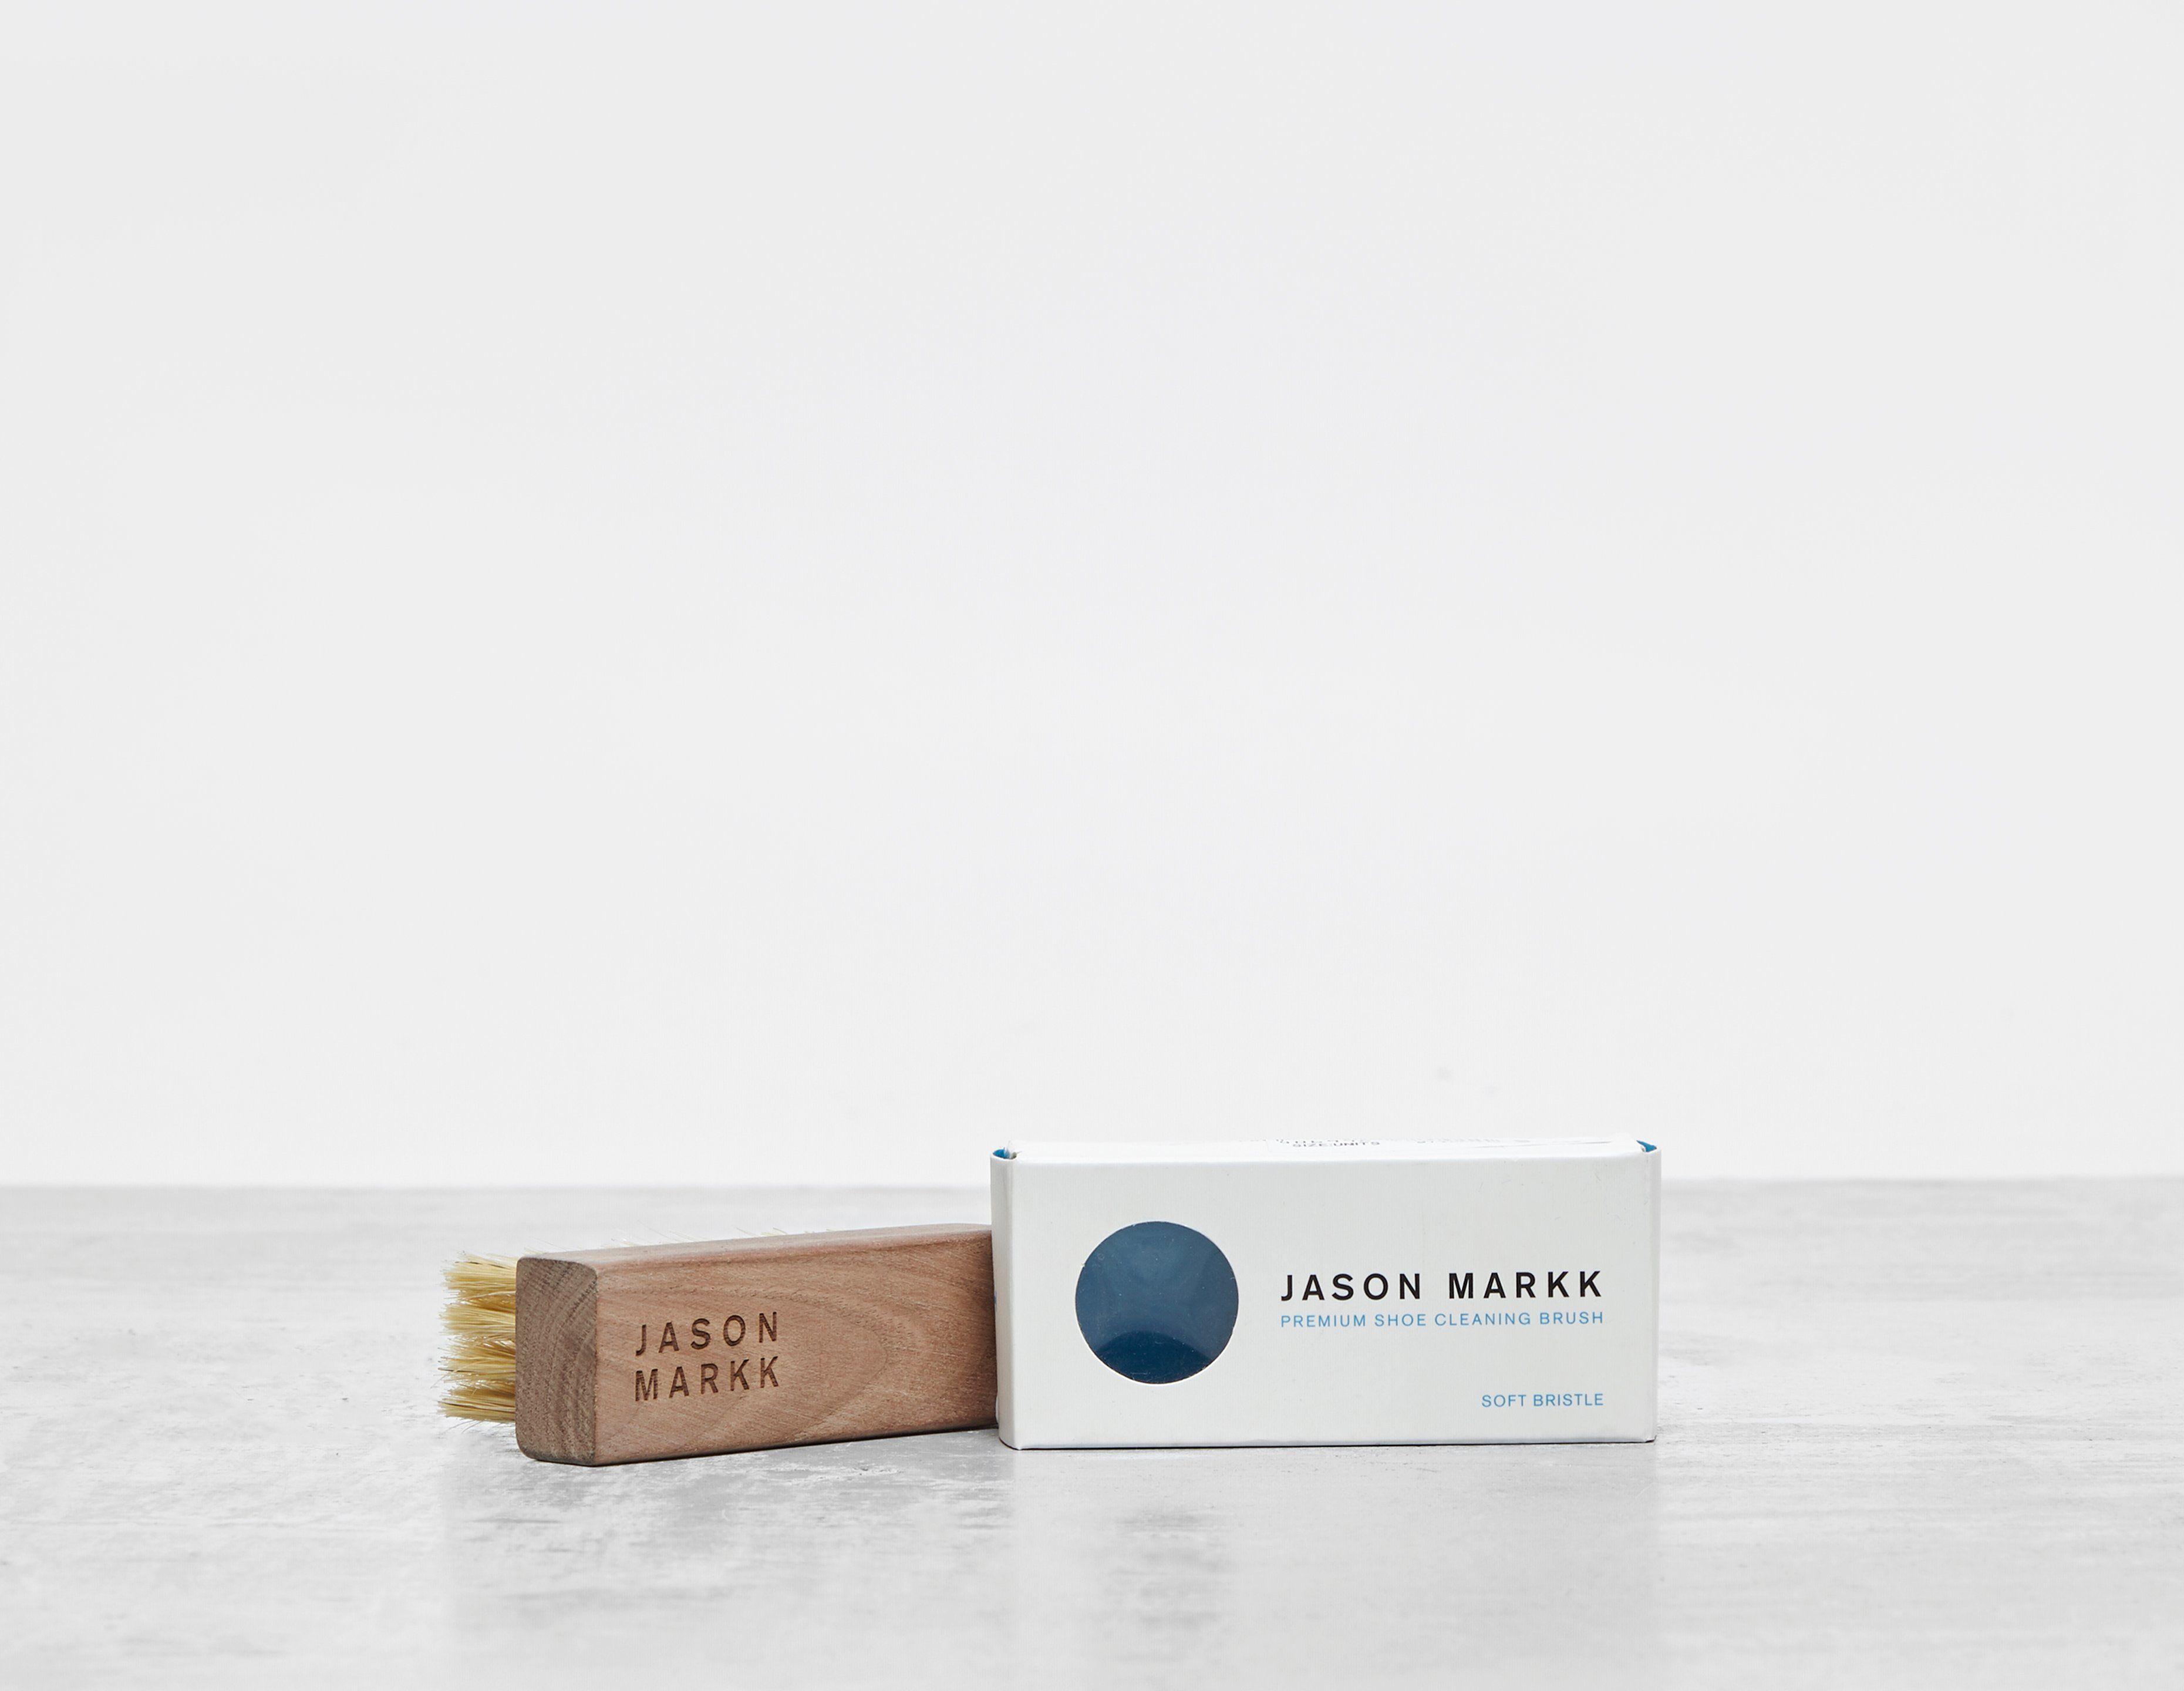 Jason Markk Premium Brush